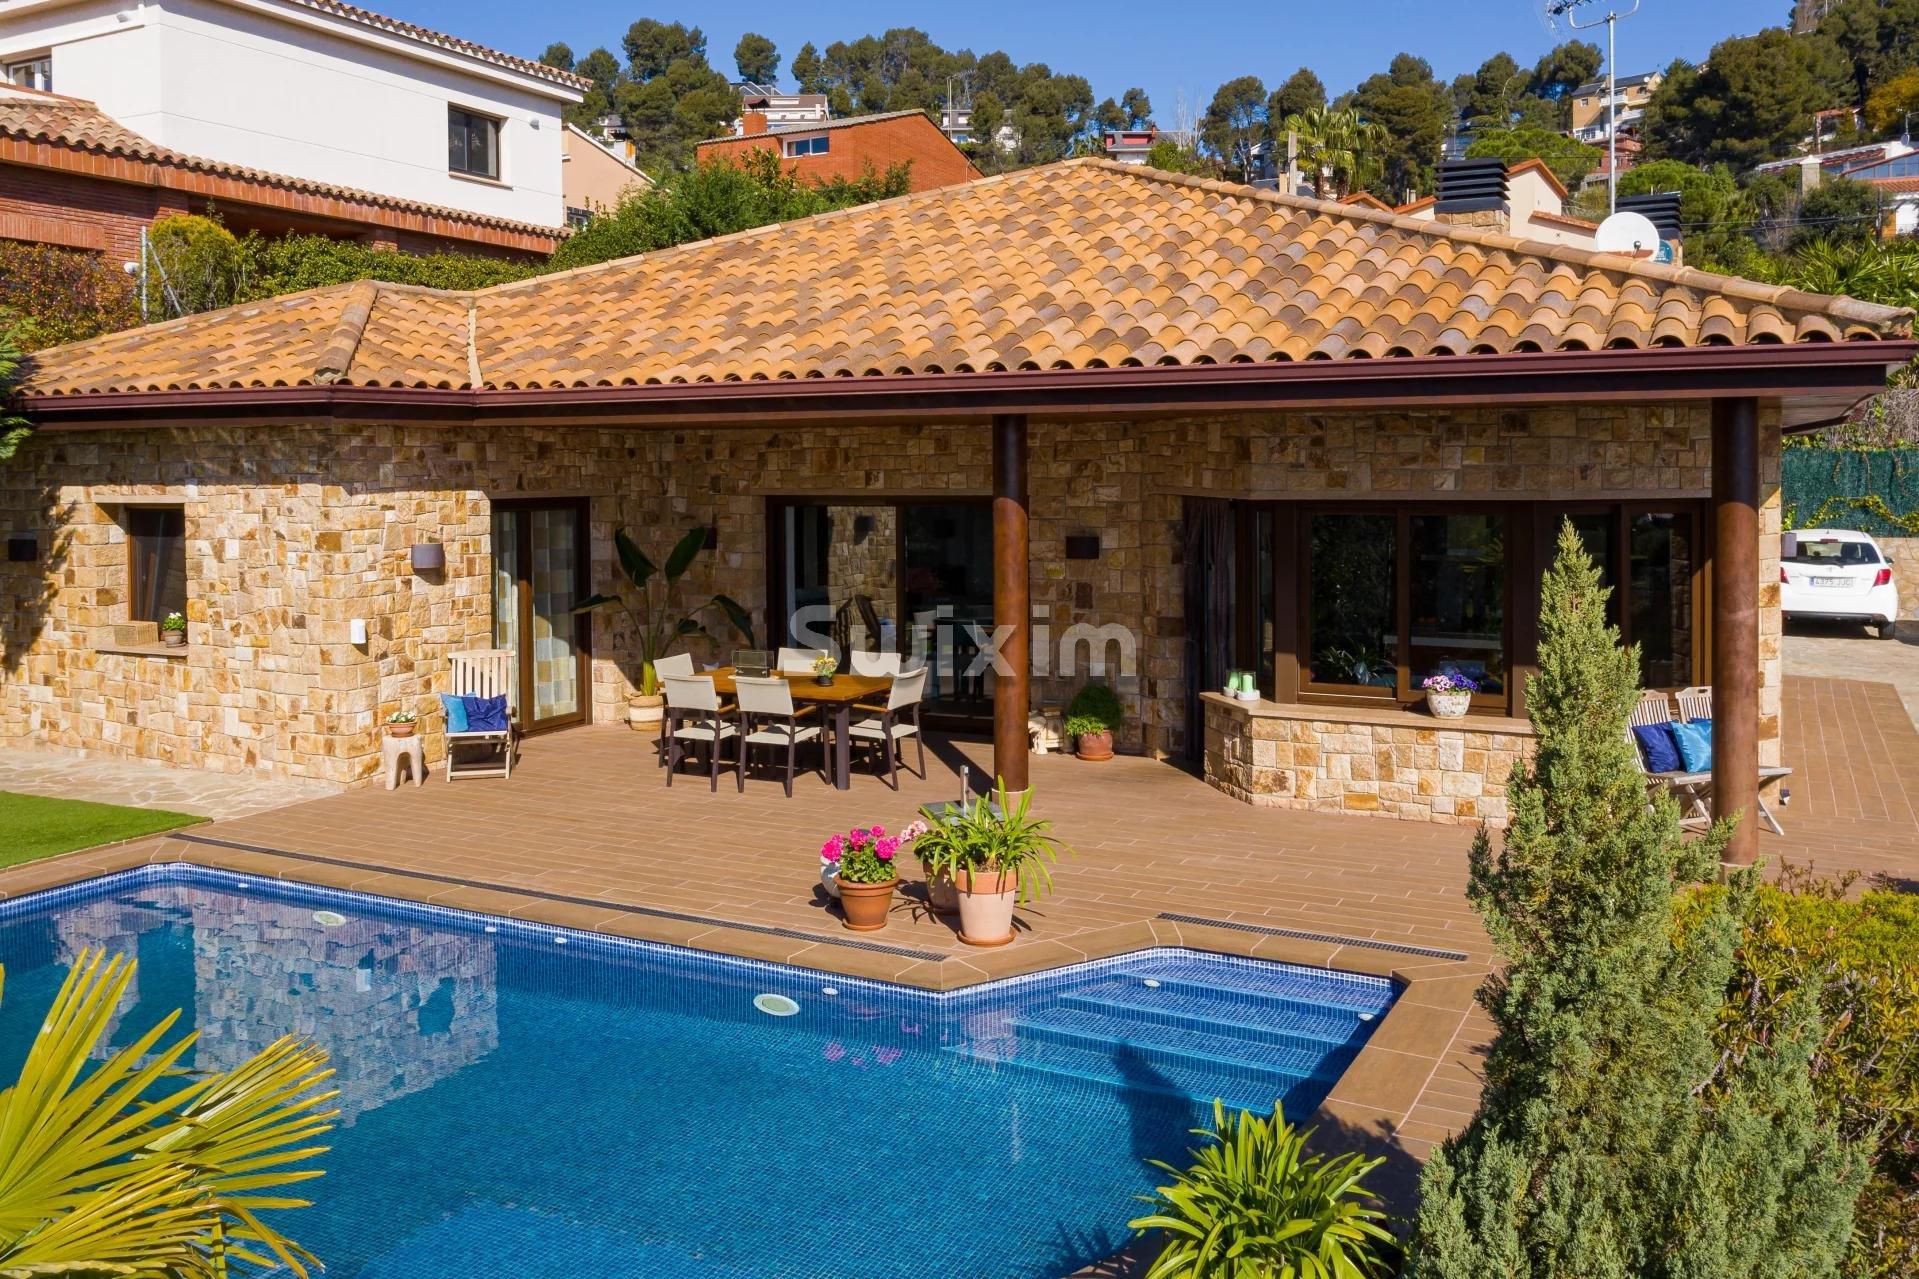 Fantastique villa avec piscine et jardin